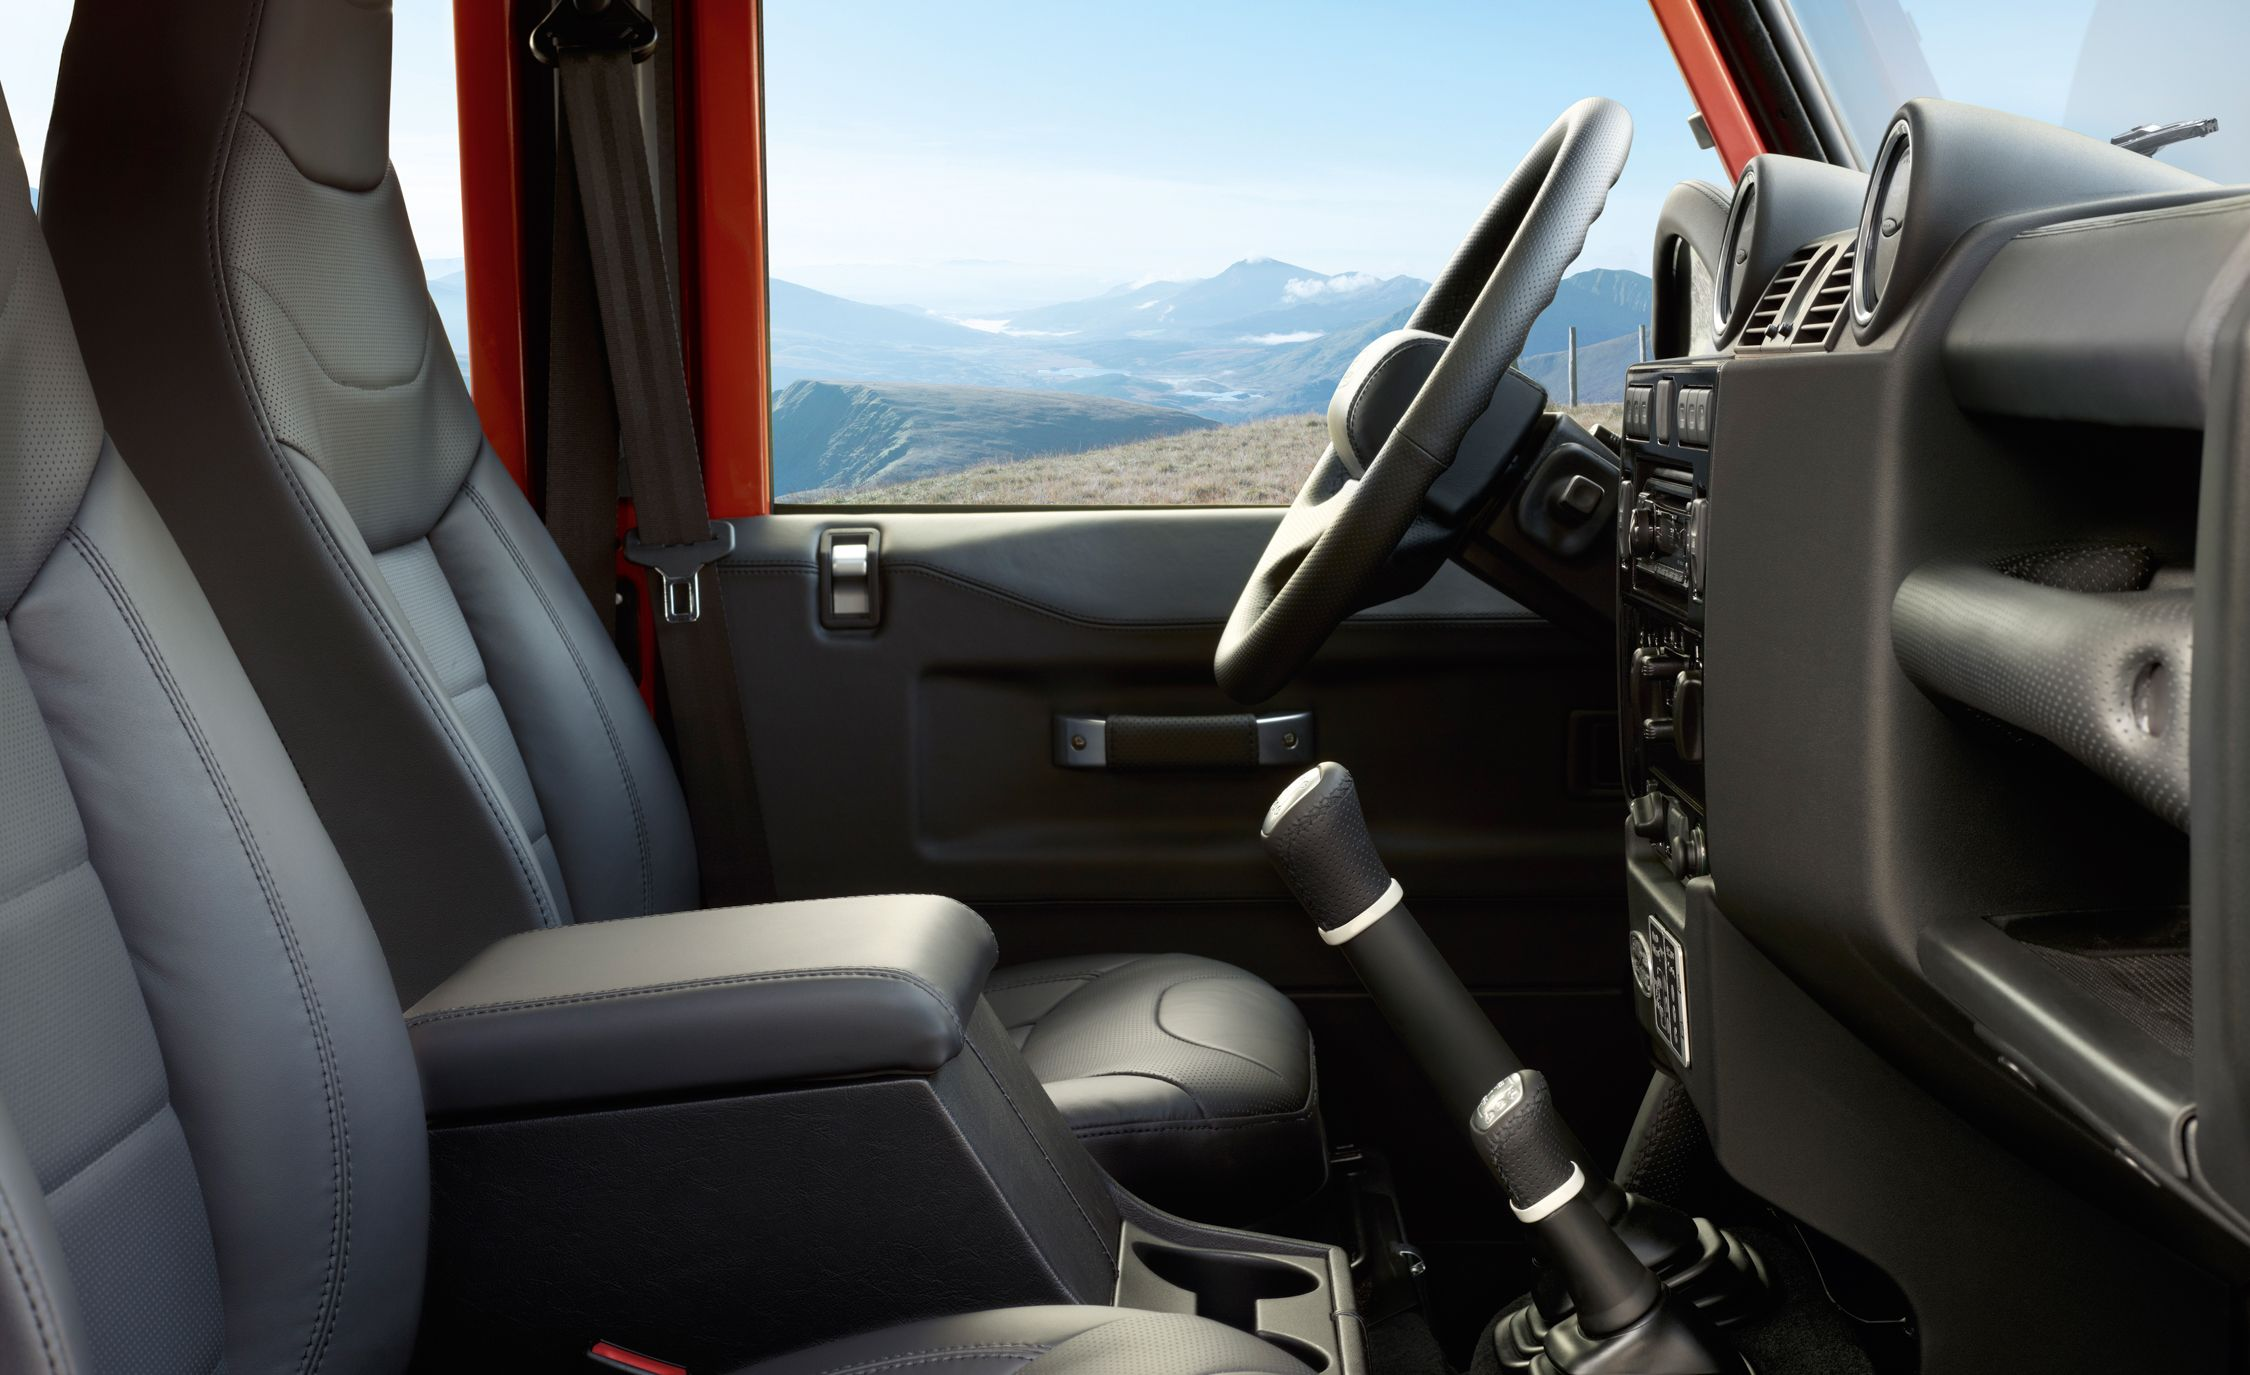 2020 Land Rover Defender Reviews Land Rover Defender Price Photos